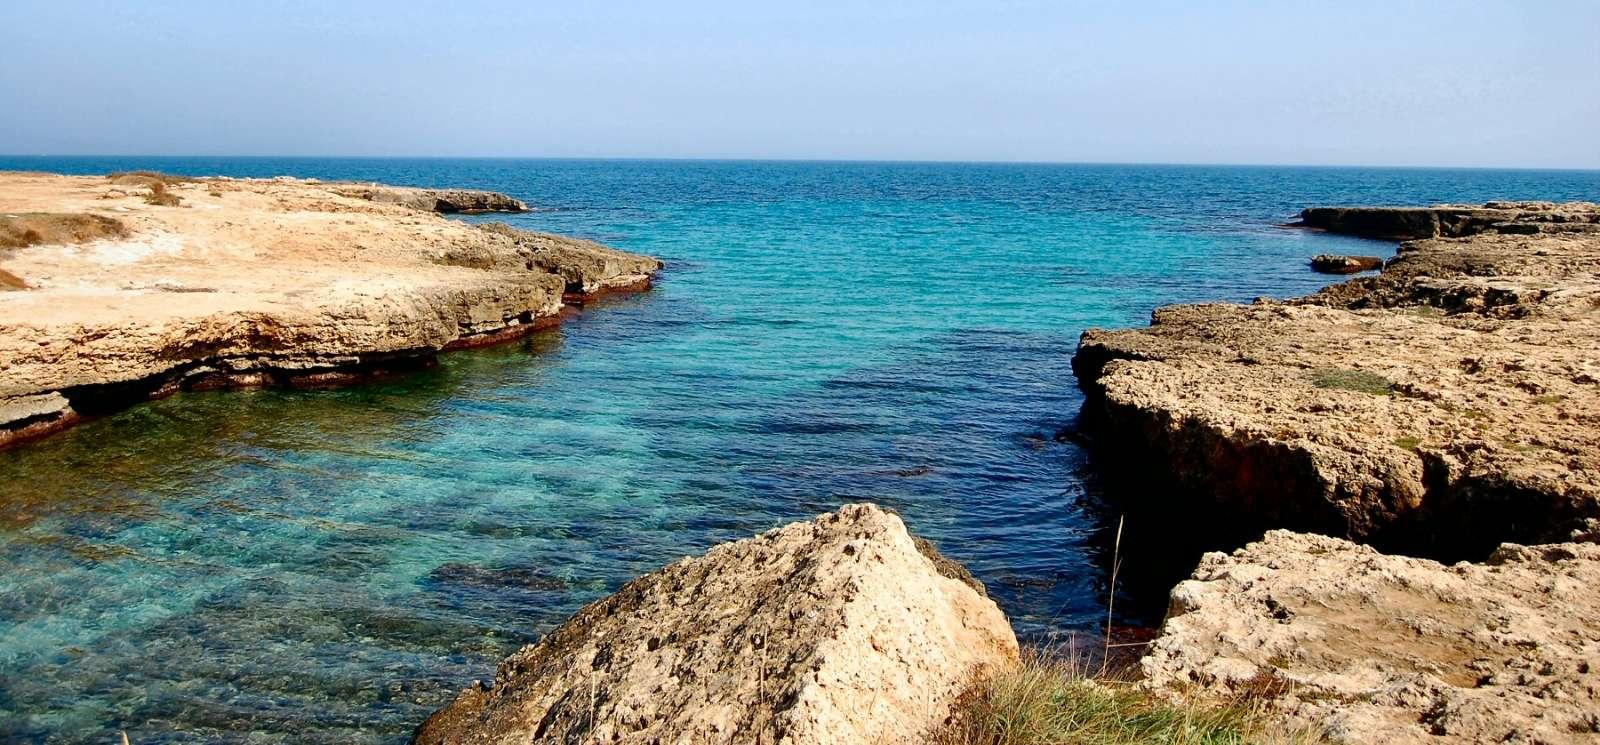 Kusten nära Polignano a Mare